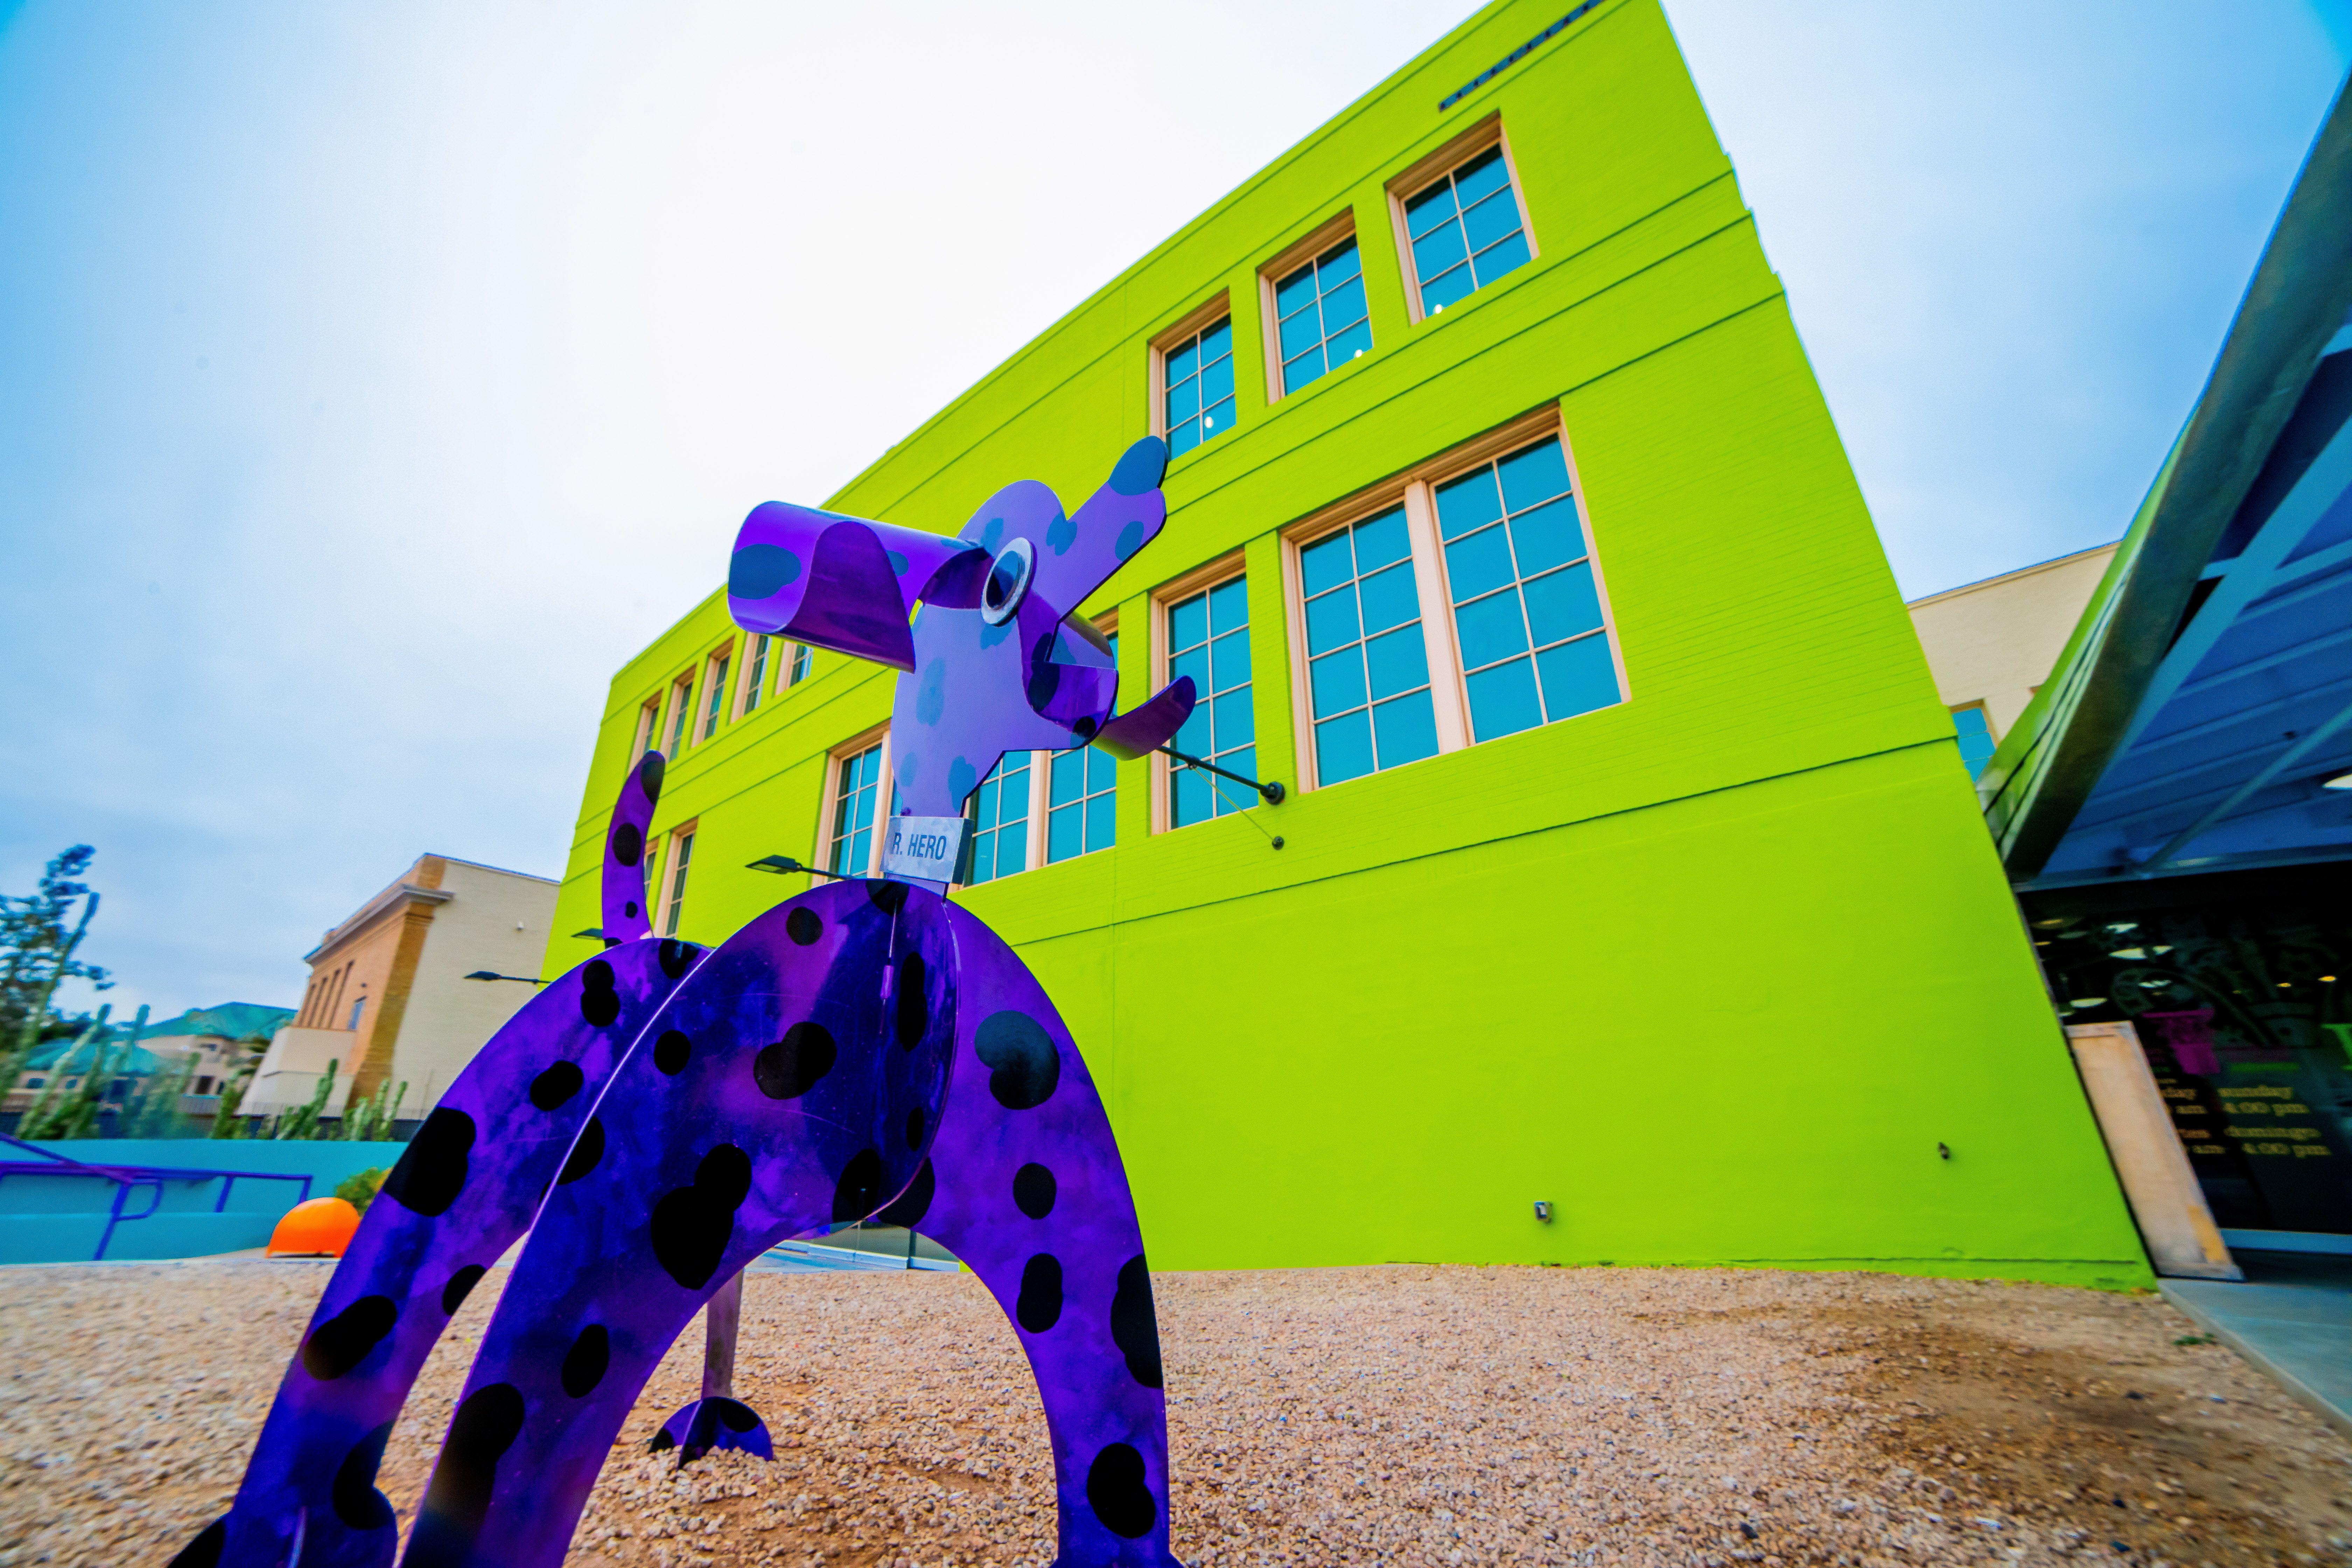 The Phoenix Children's Museum